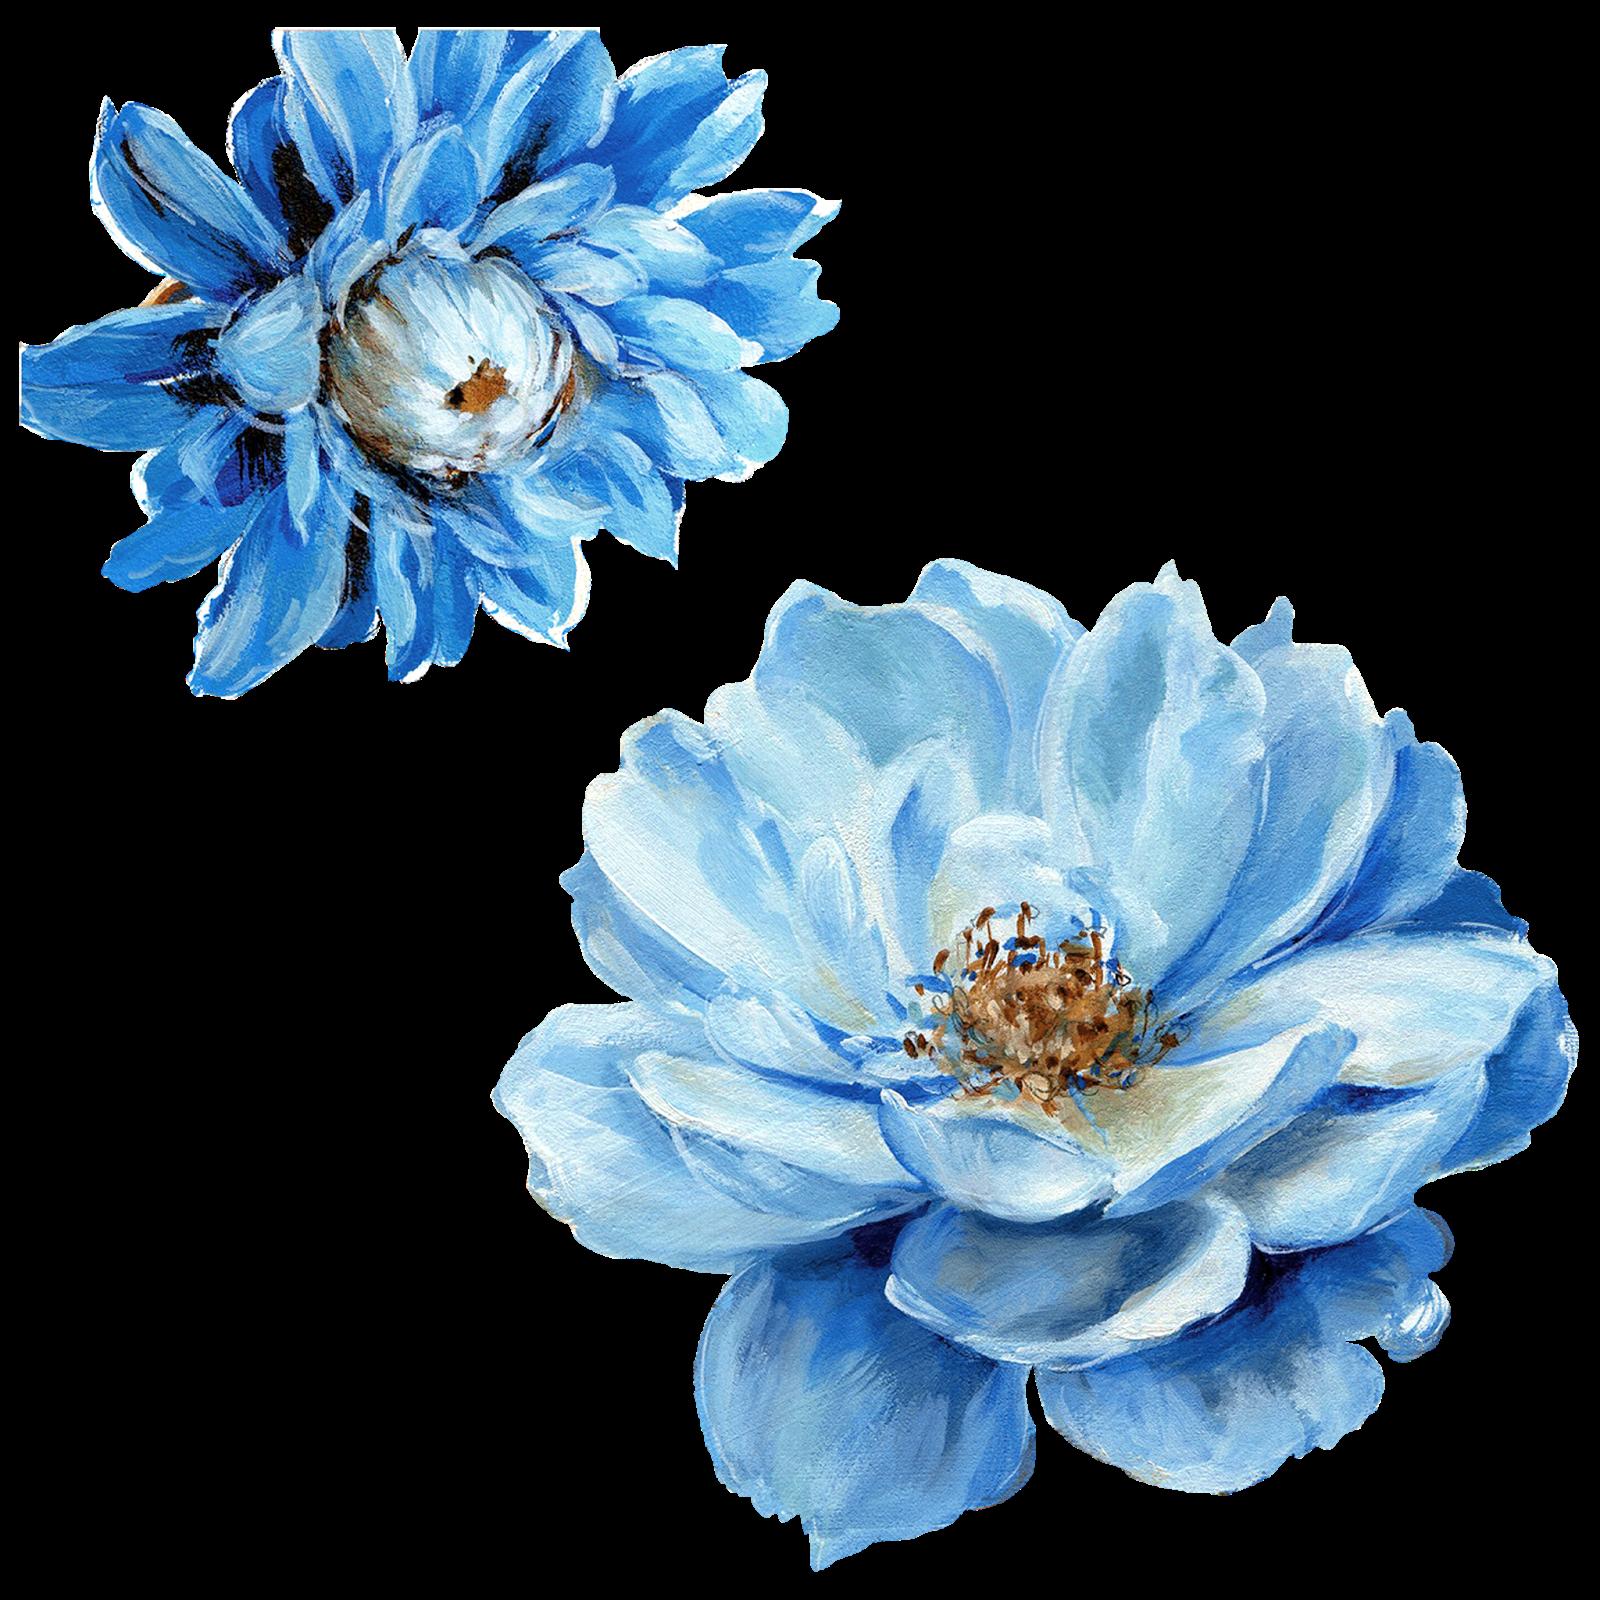 Decoupage Flower Flower Painting Flower Painting Png Flower Pattern Flower Png Lisa Audit Flower Png Lisa Audit Png Lisa Audit Painting Decoupage Bunga